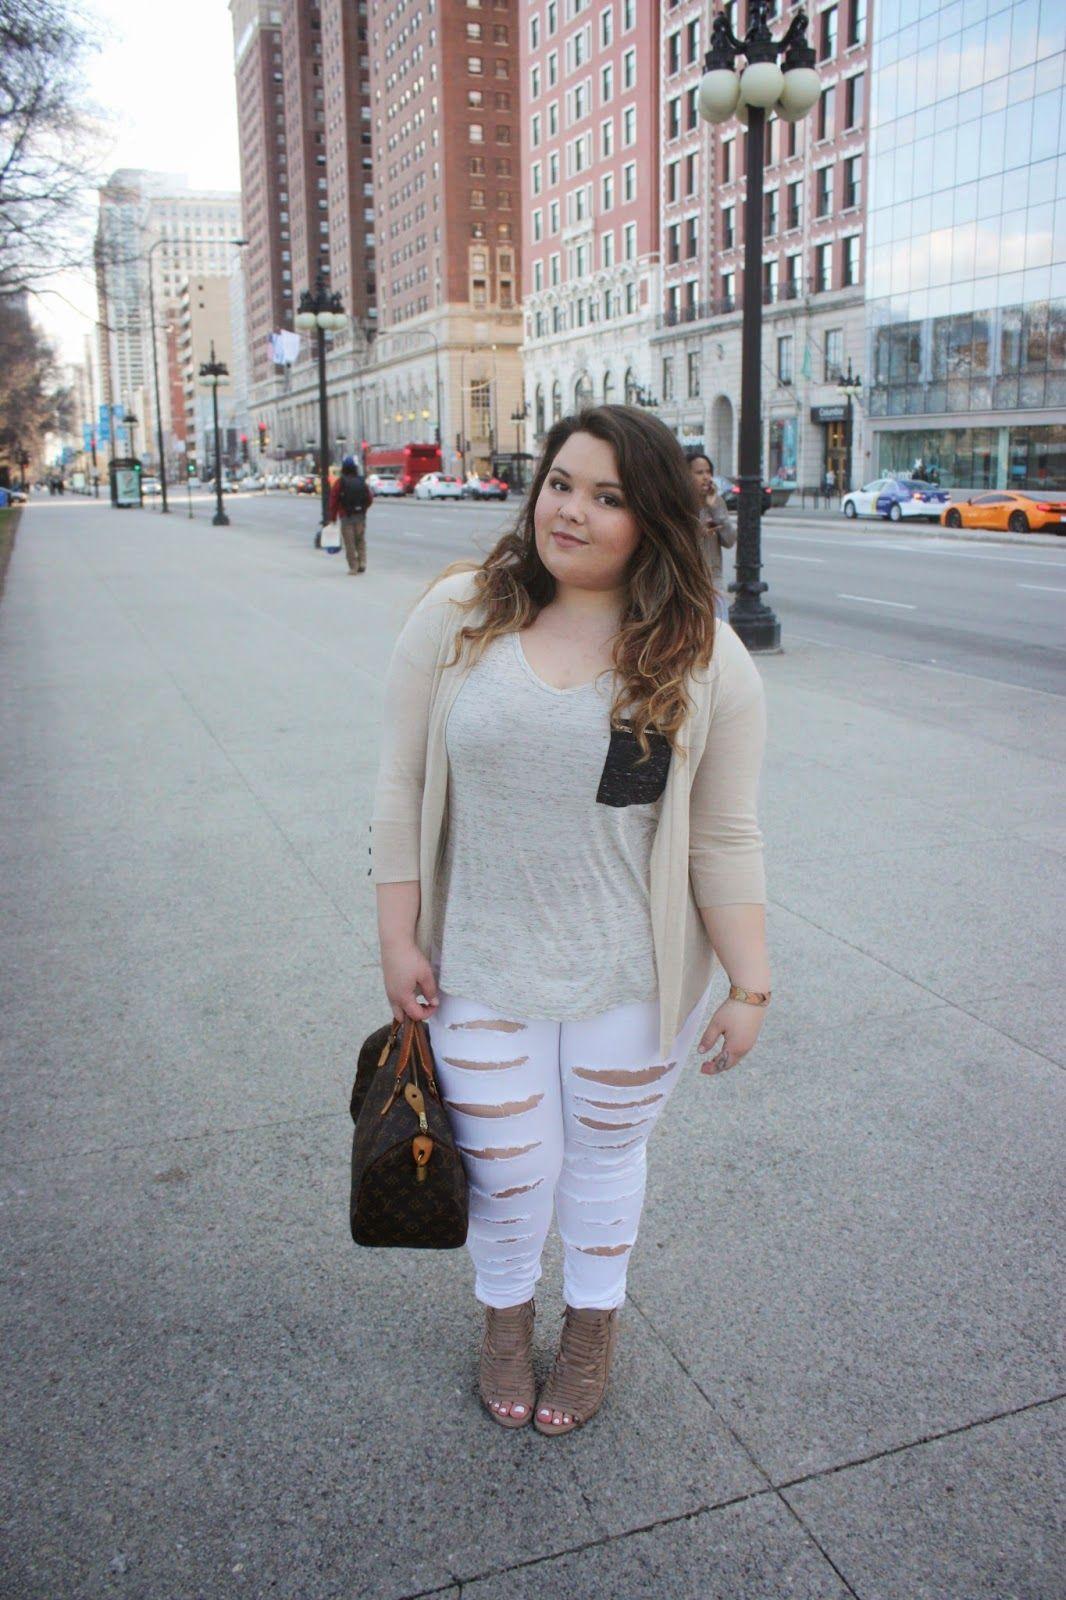 Fat Girl On Pole